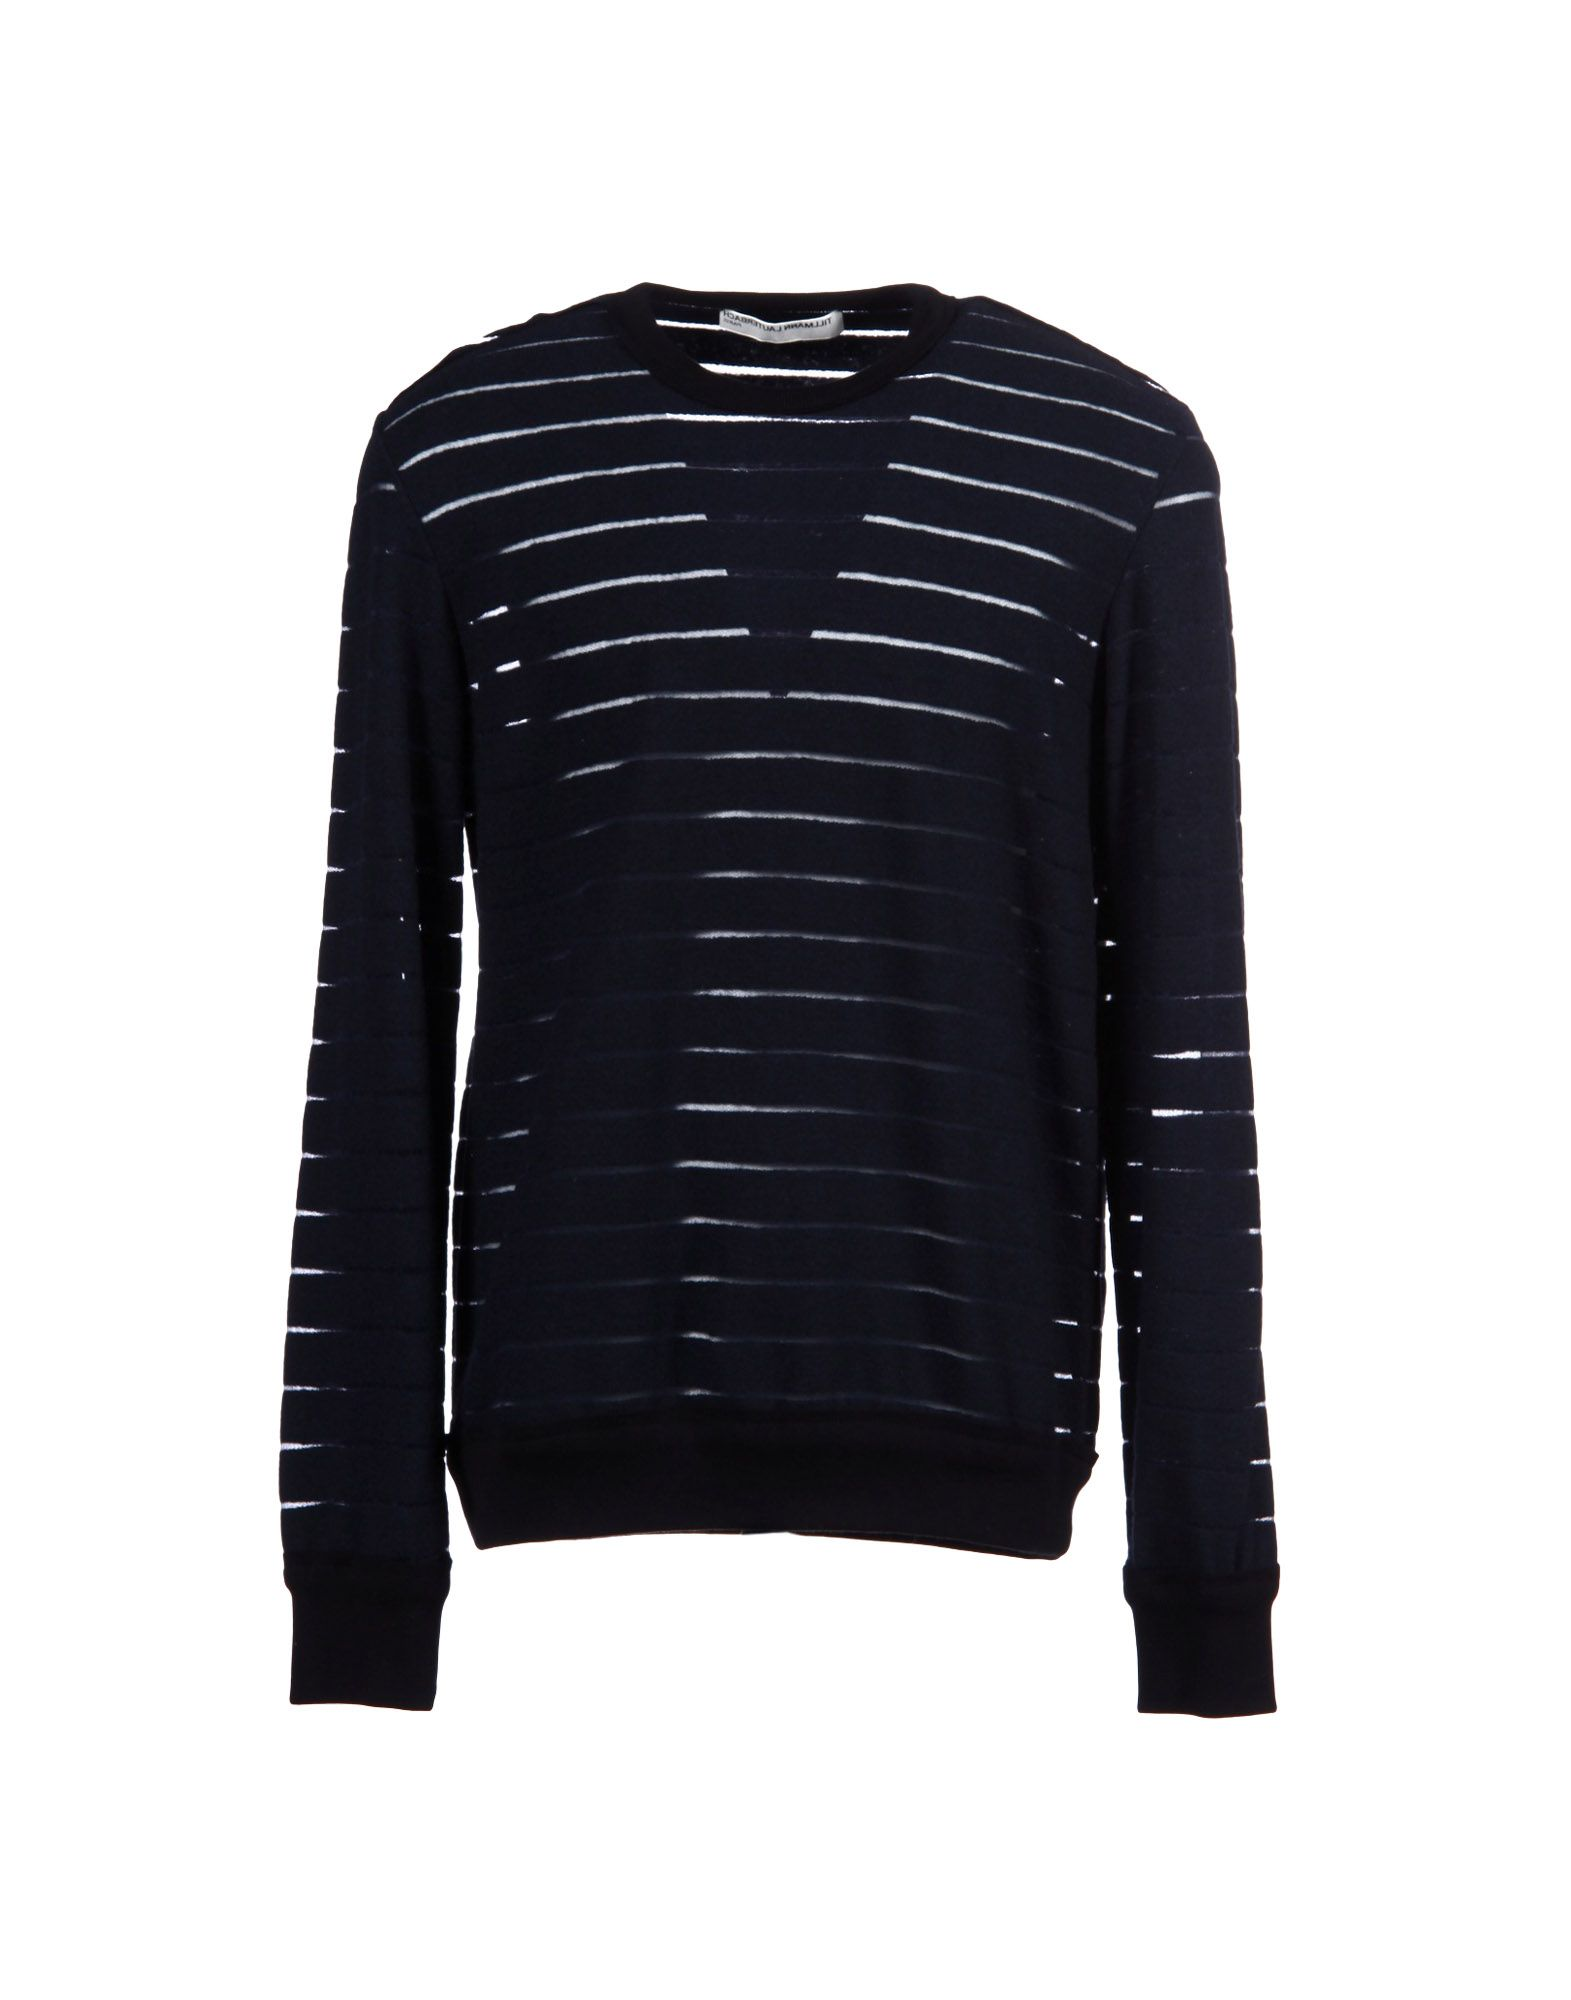 TILLMANN LAUTERBACH Sweater in Dark Blue